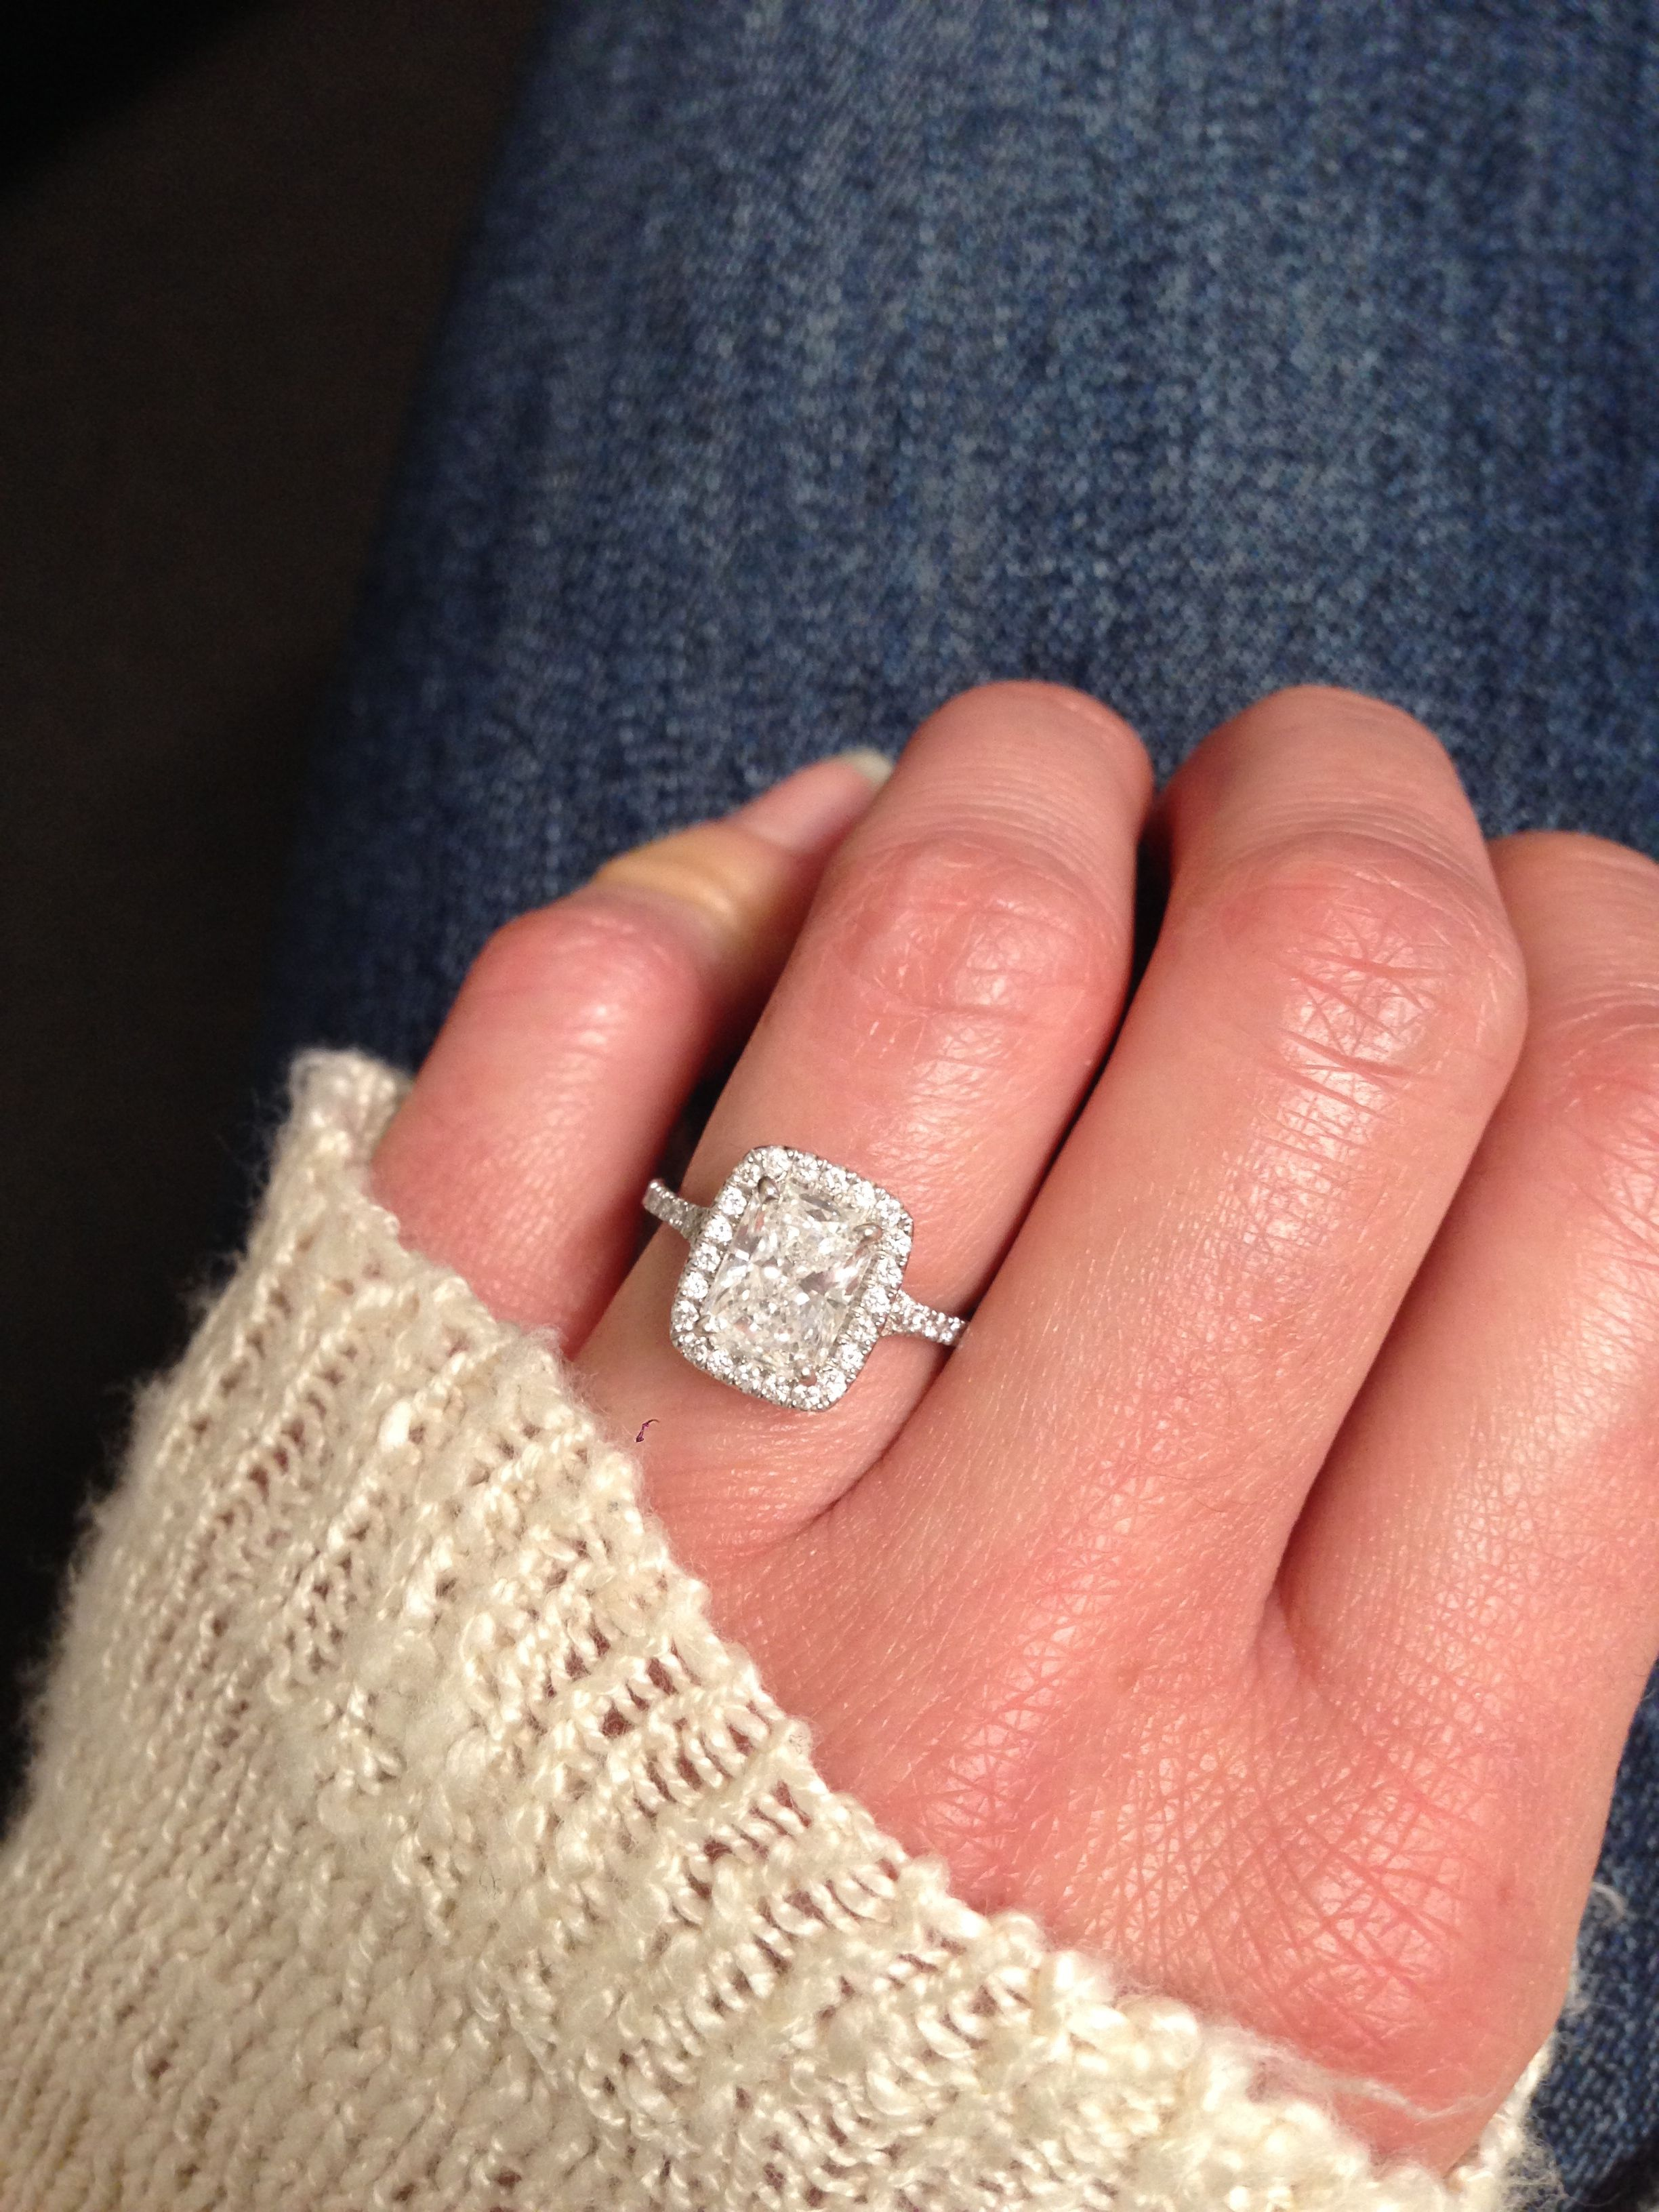 Perfection Radiant cut engagement ring Halo cushion setting